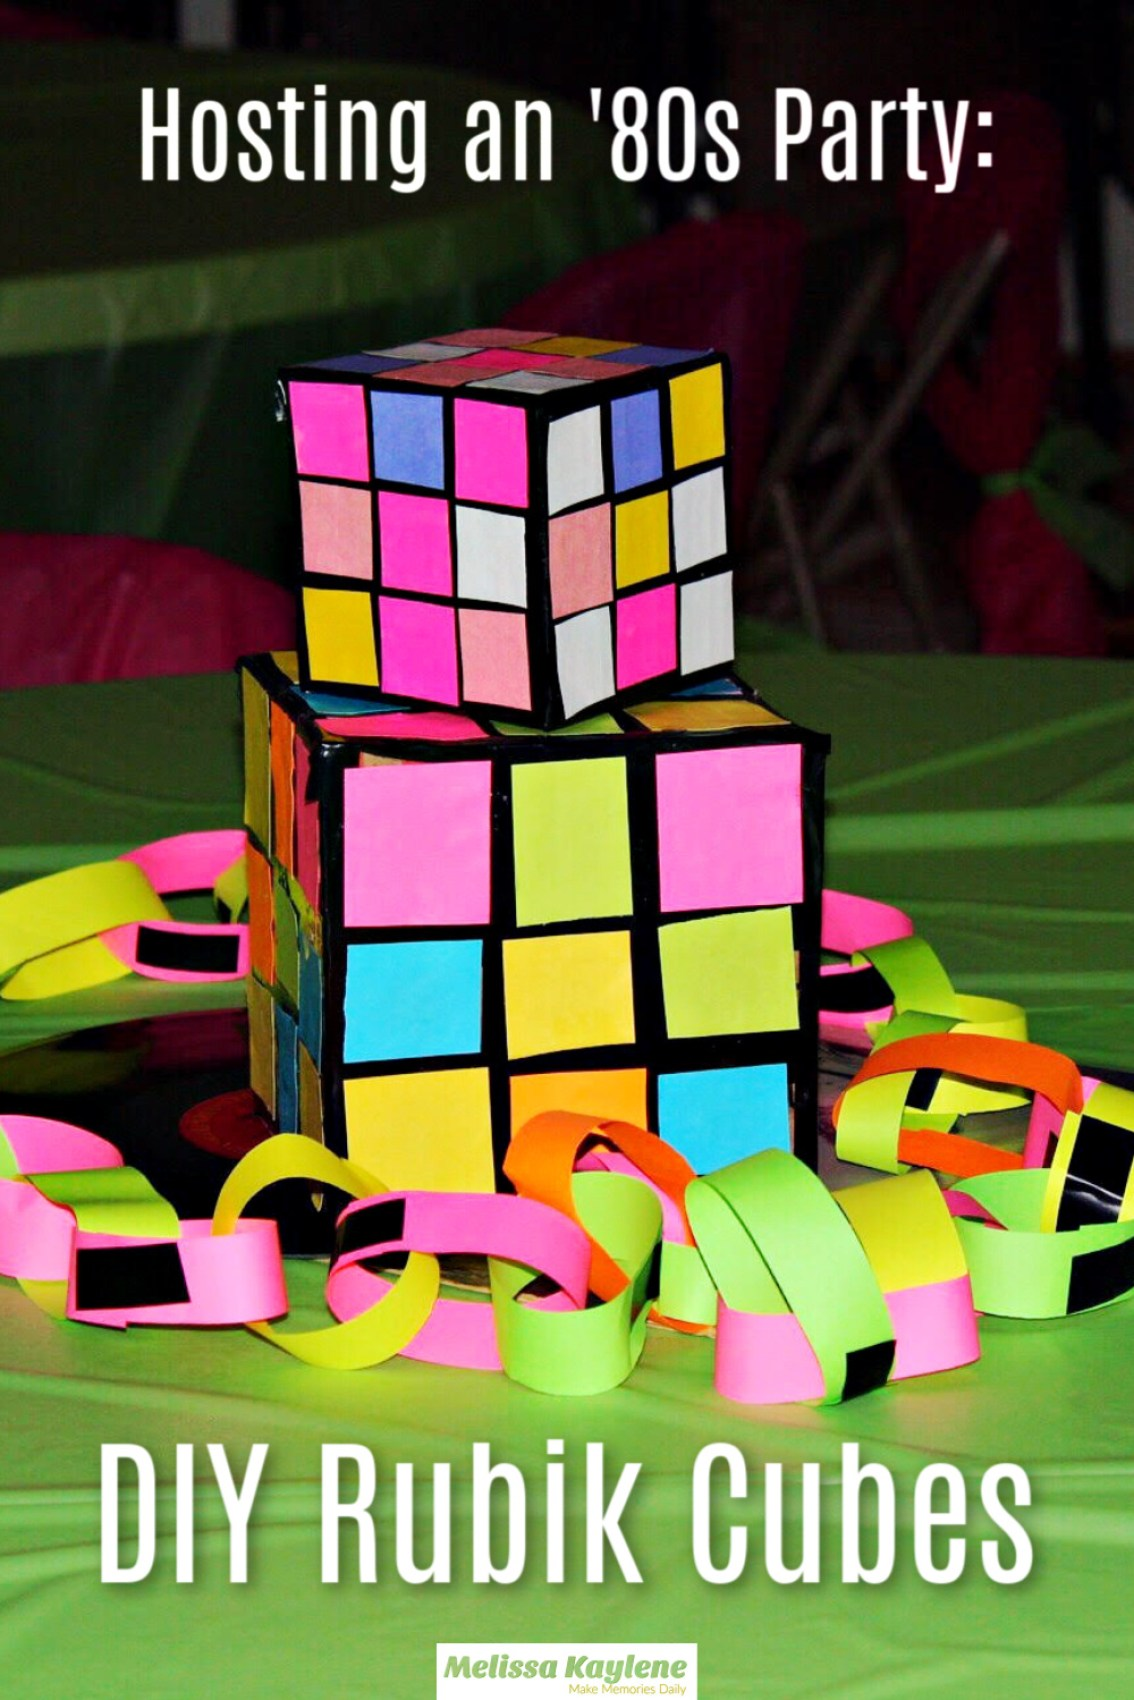 DIY Rubik Cubes 1980's Party